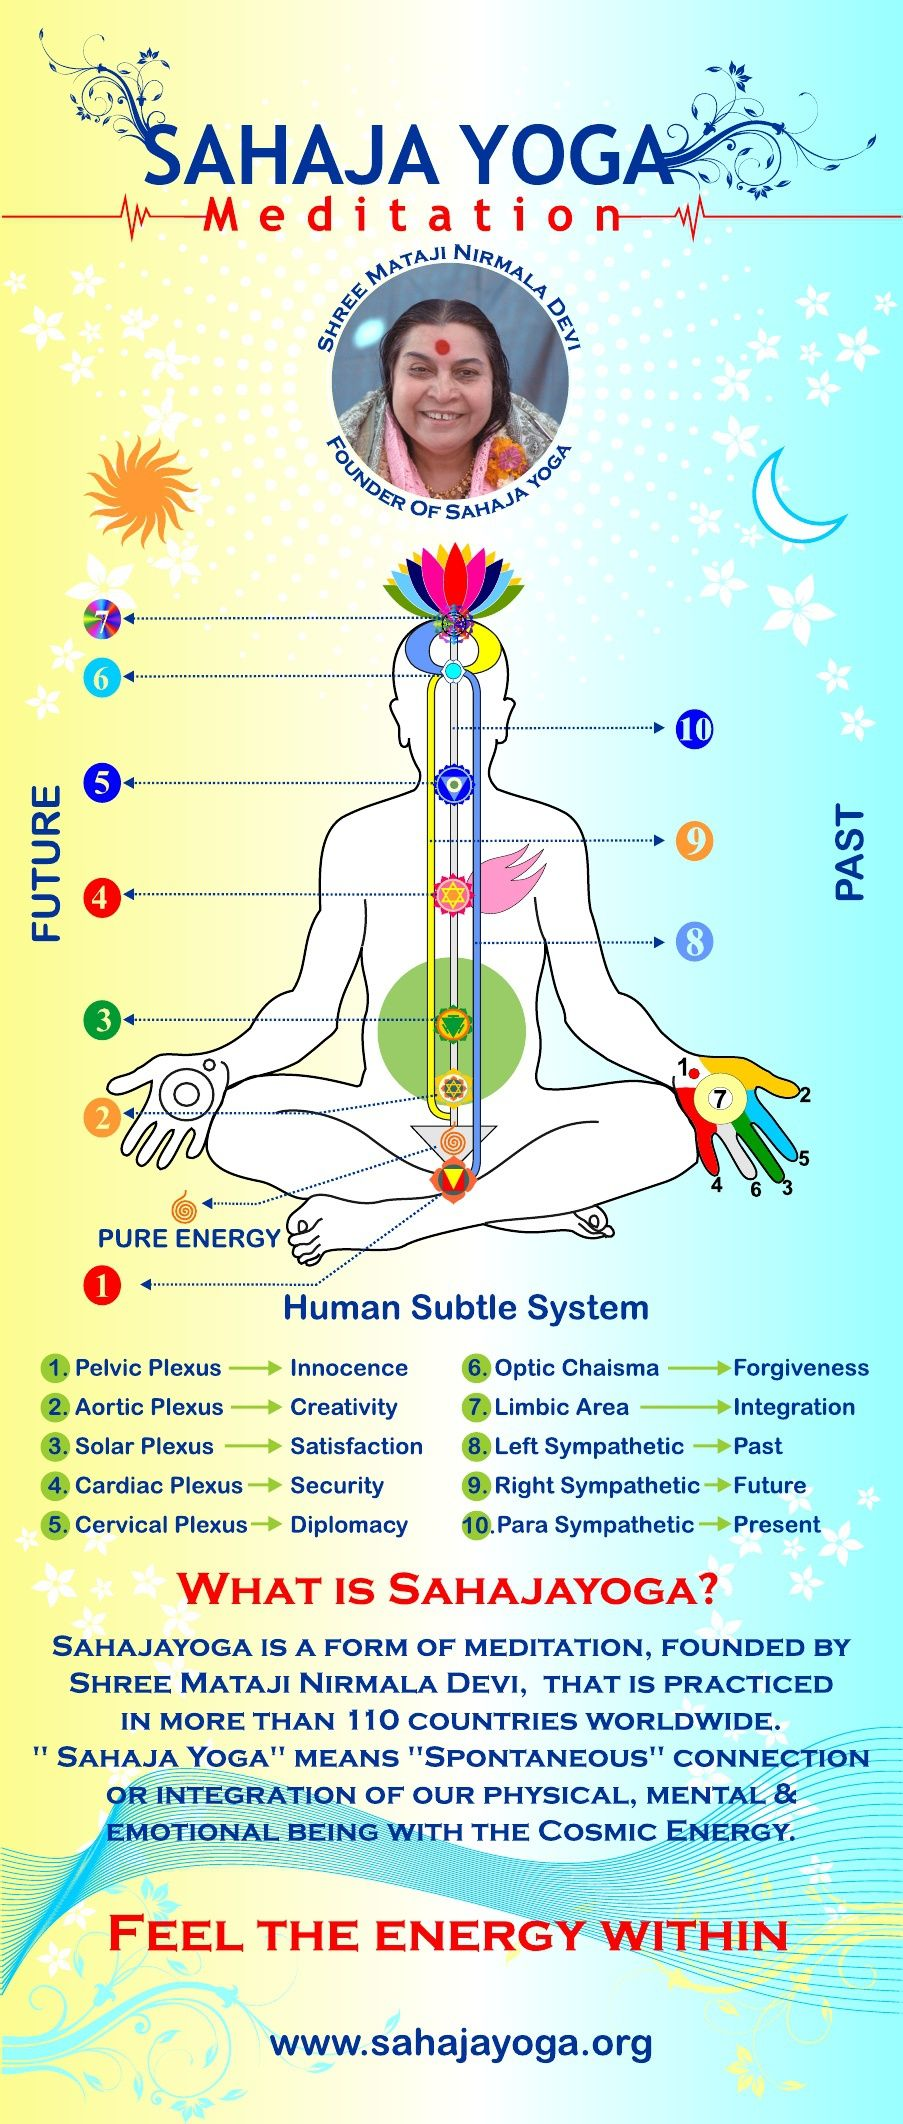 Free Sahajayoga Meditation - Minneapolis